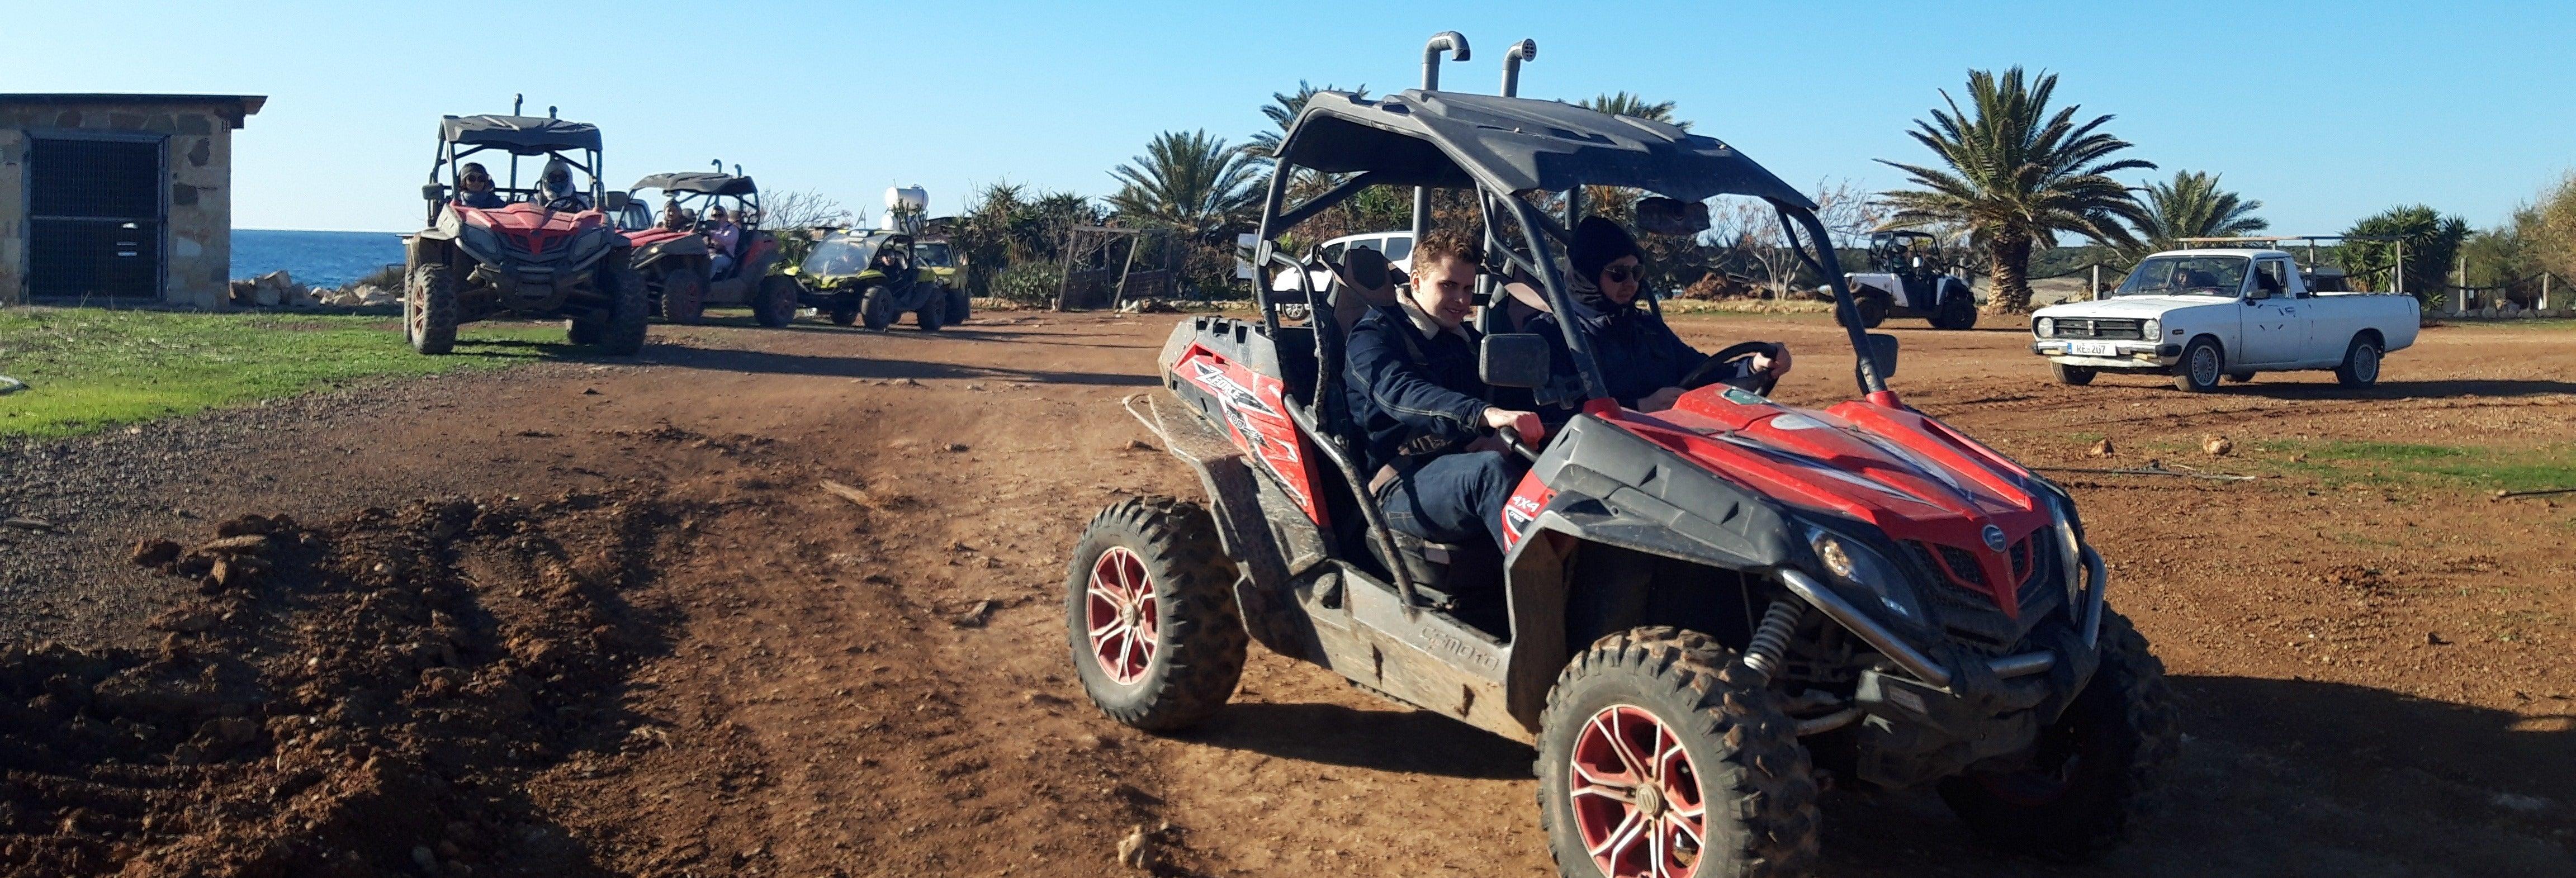 Tour en buggy por el Parque Nacional de Akamas